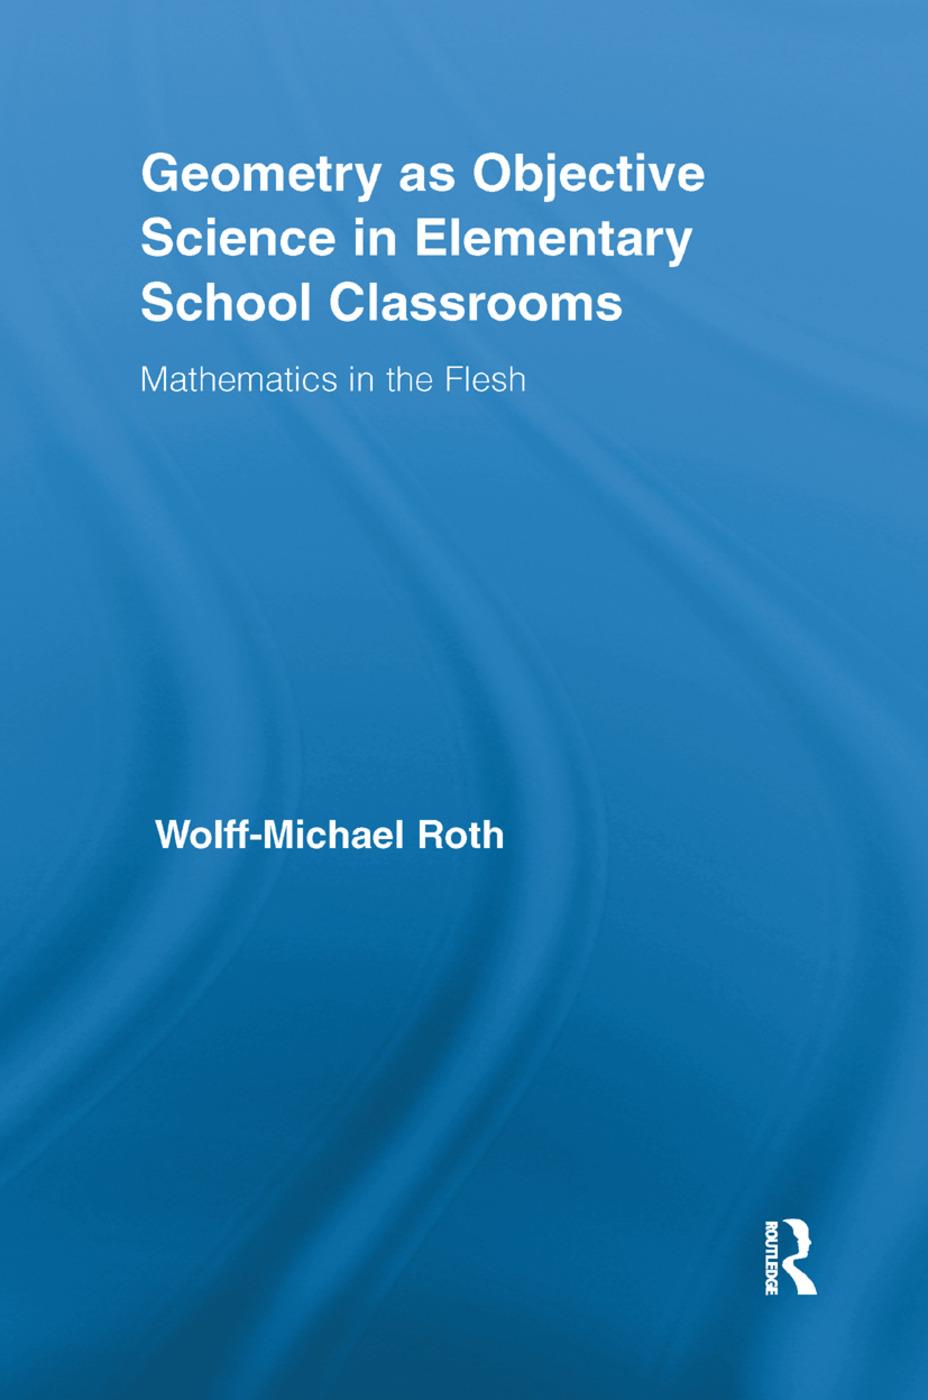 Geometry as Objective Science in Elementary School Classrooms